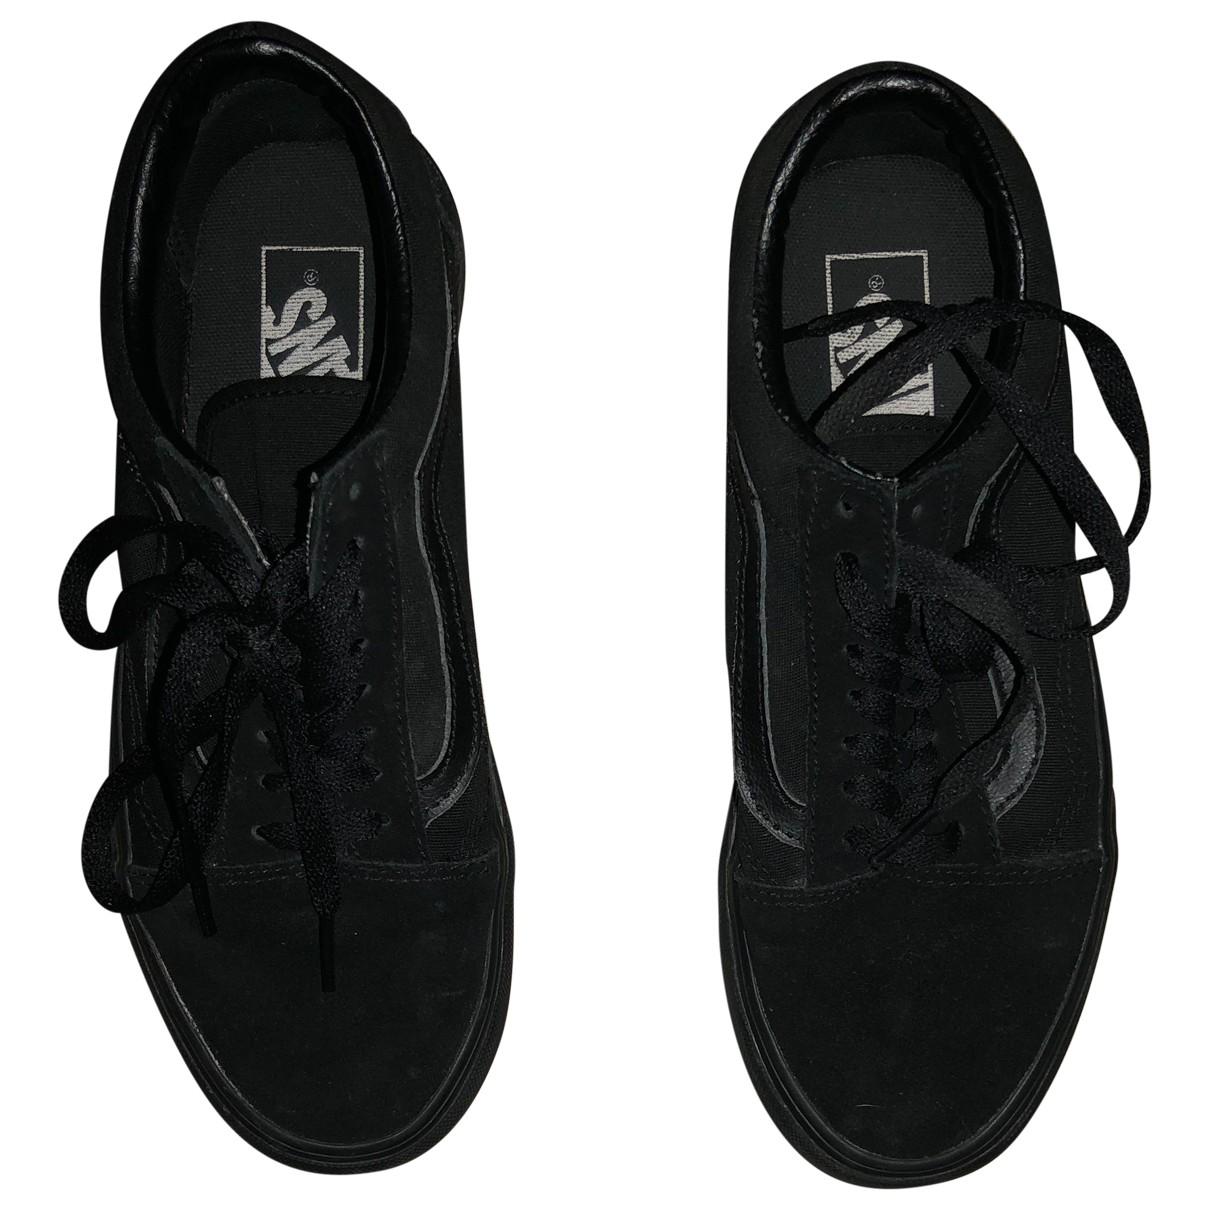 Vans N Black Cloth Trainers for Women 39 EU